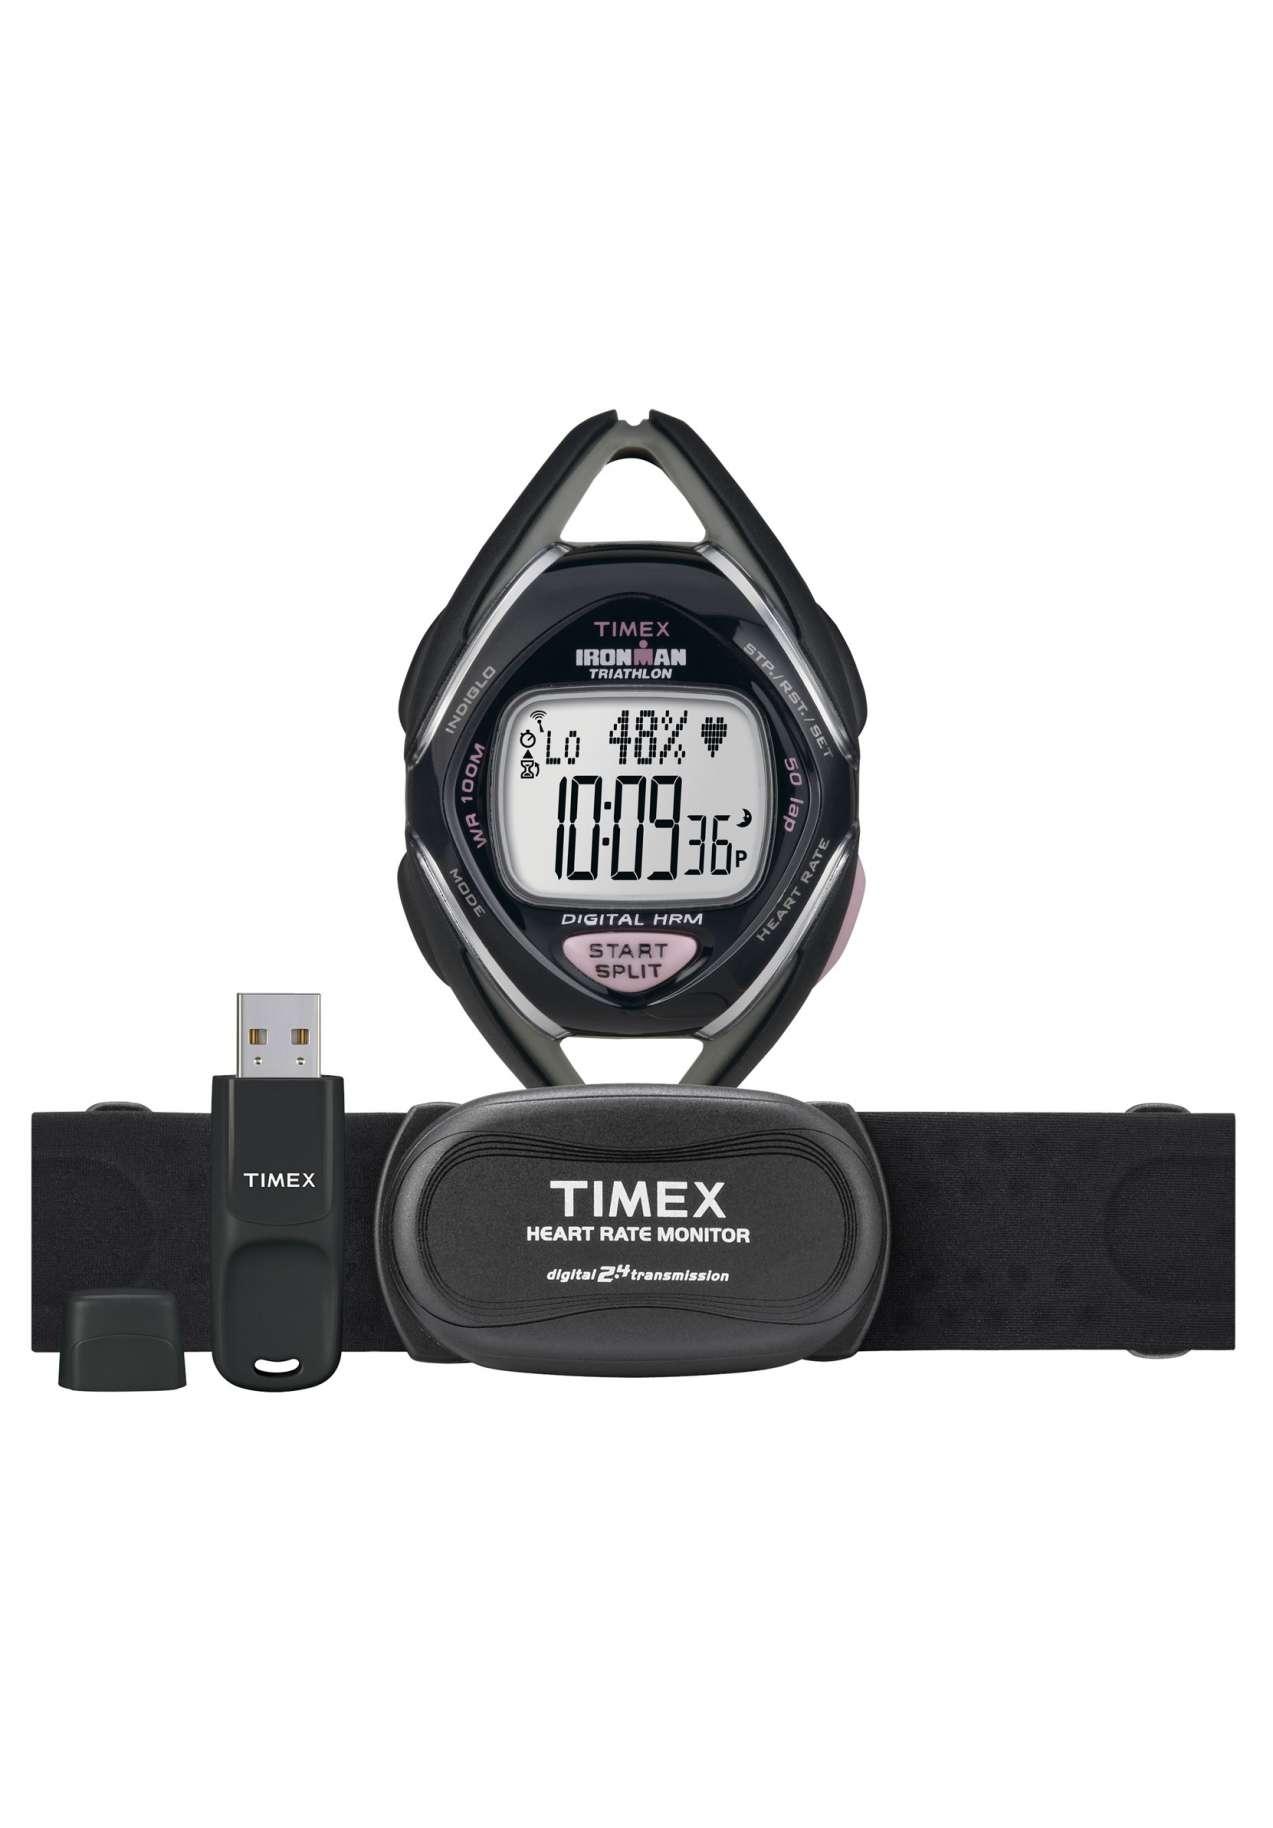 kaufen timex sportuhr ironman triathlon race trainer. Black Bedroom Furniture Sets. Home Design Ideas